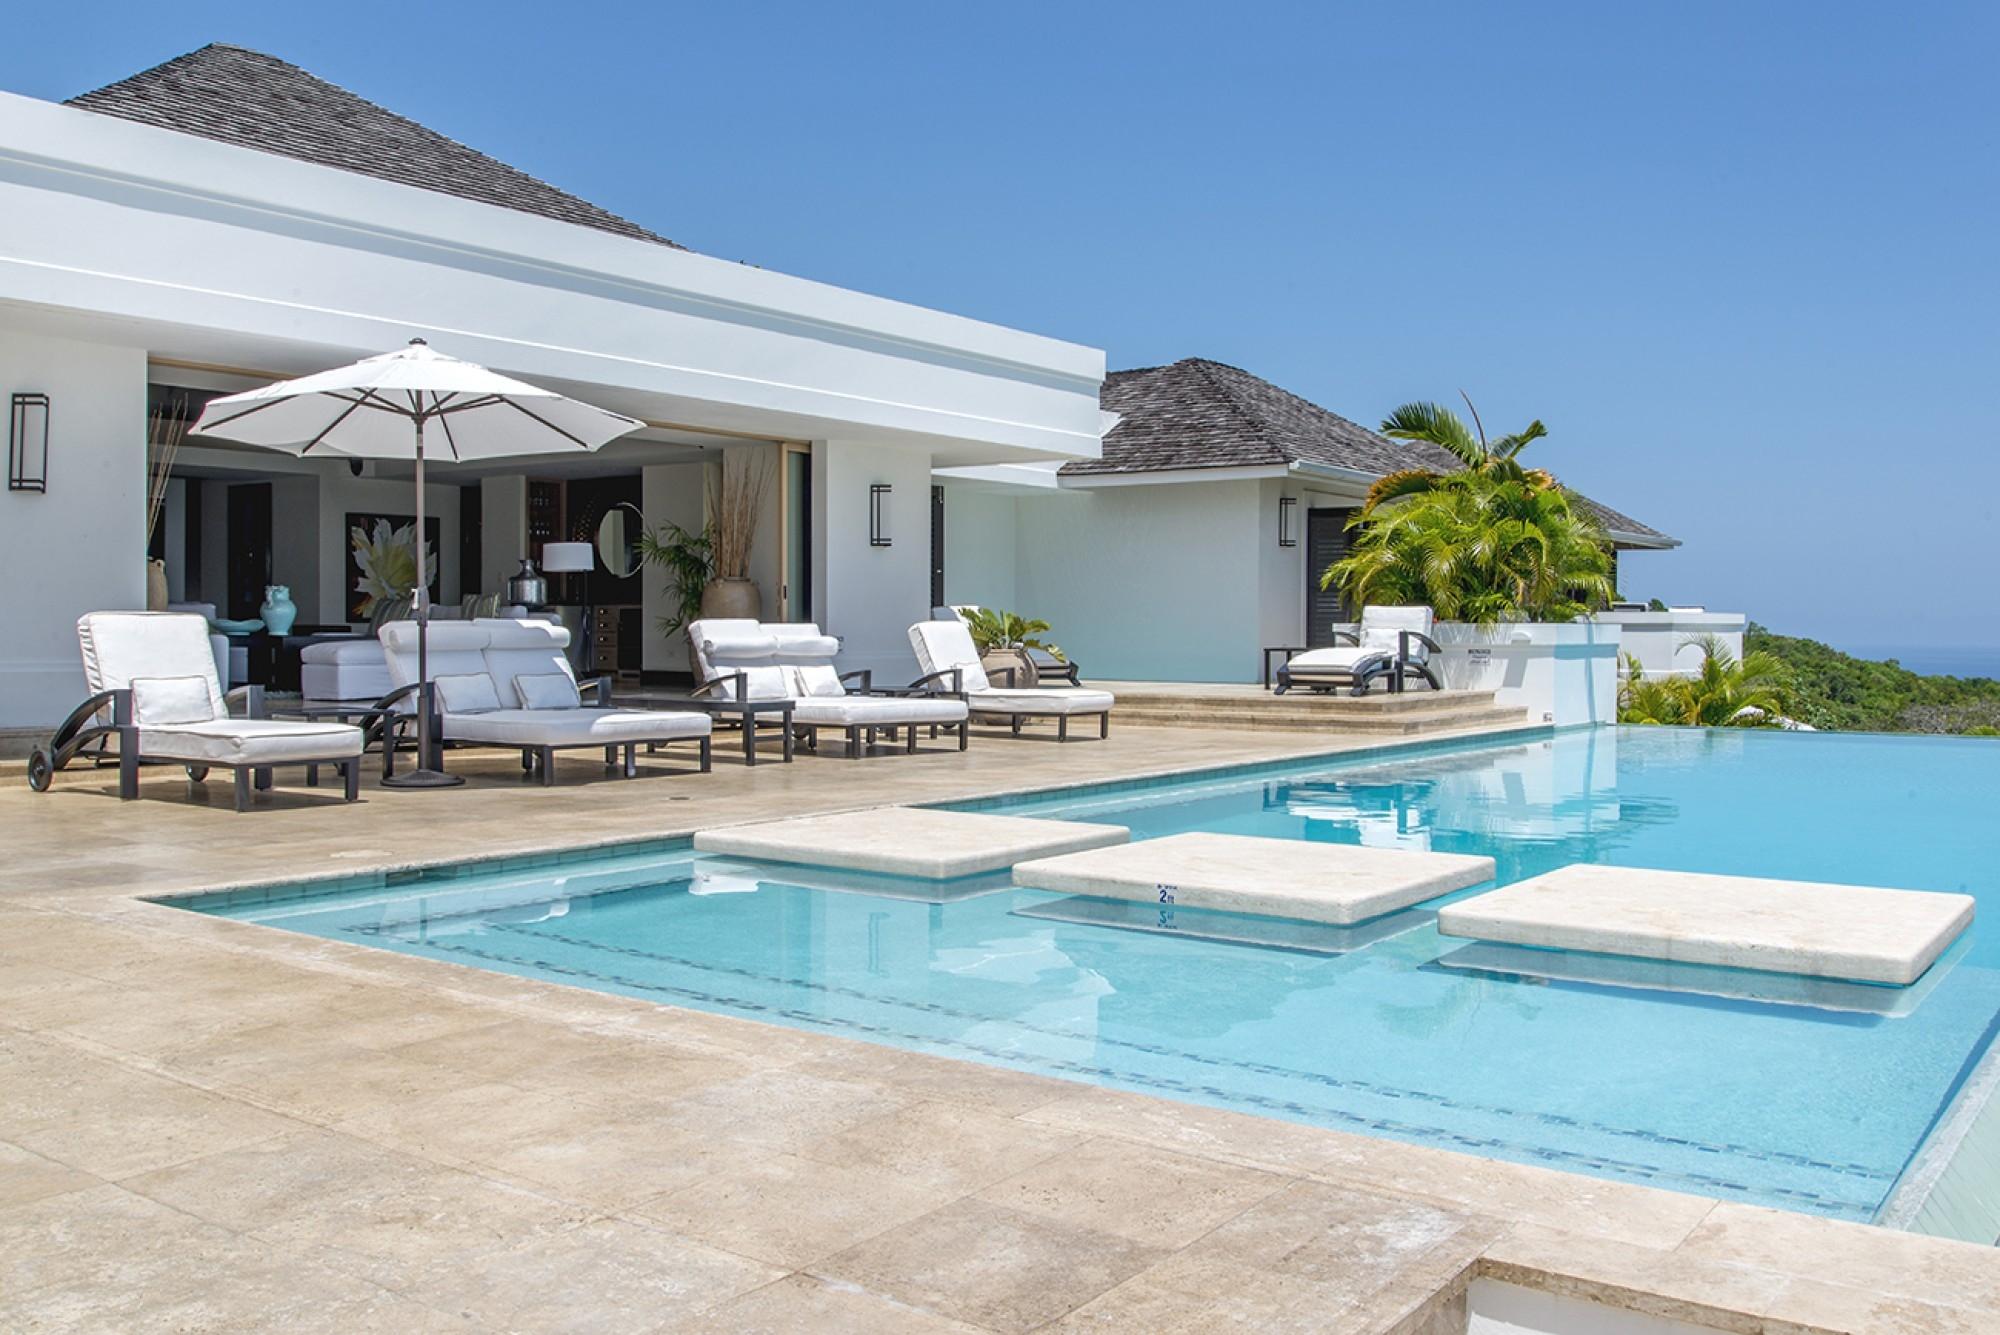 Luxury villa rentals caribbean - Jamaica - Try all club - Villa Lolita - Image 1/27